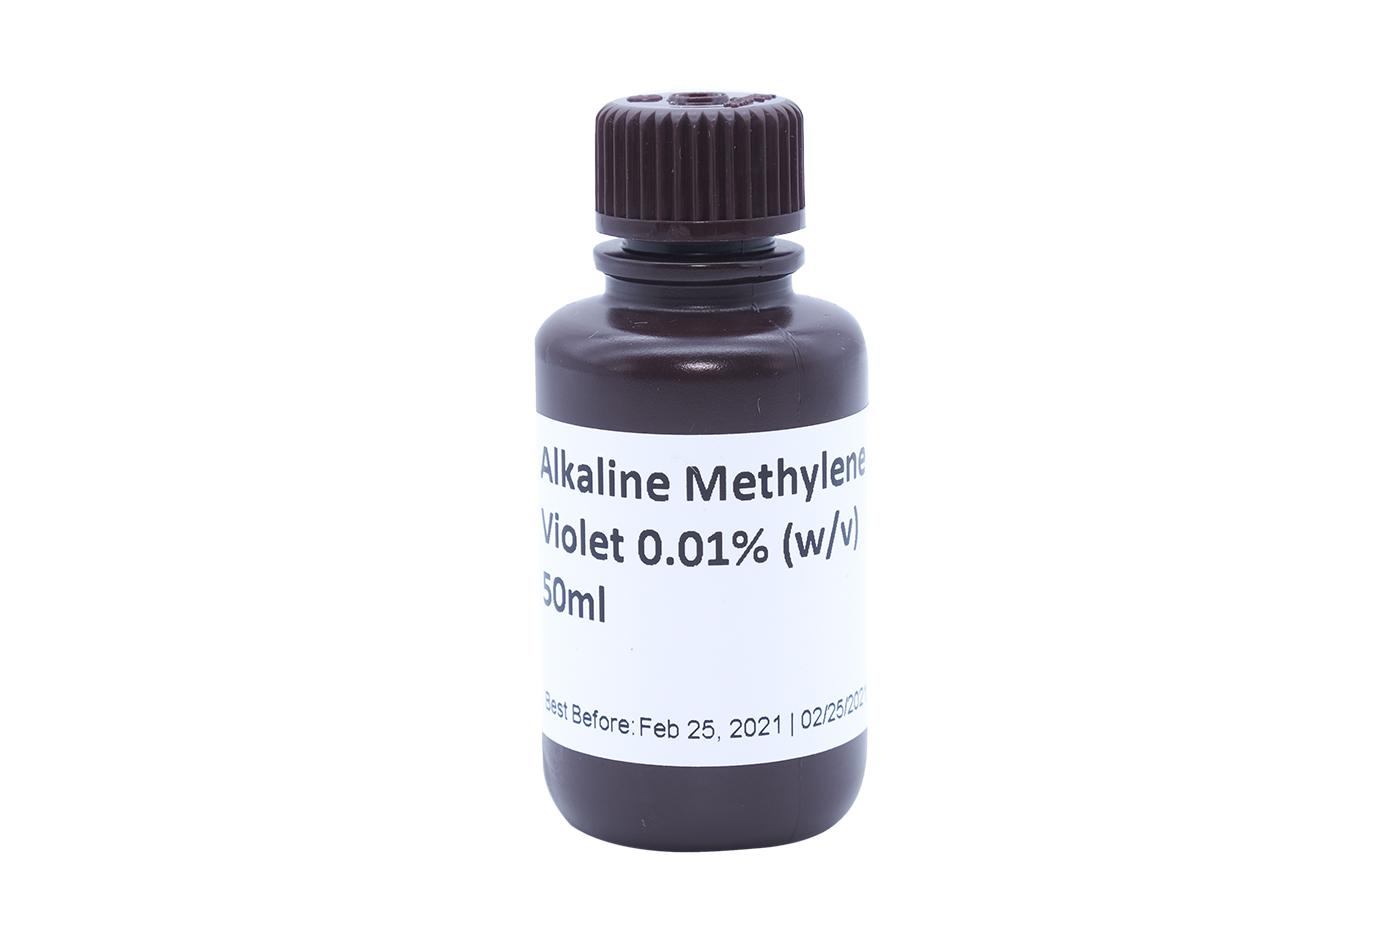 Alkaline Methylene Violet 0.01% (w/v) 50mL